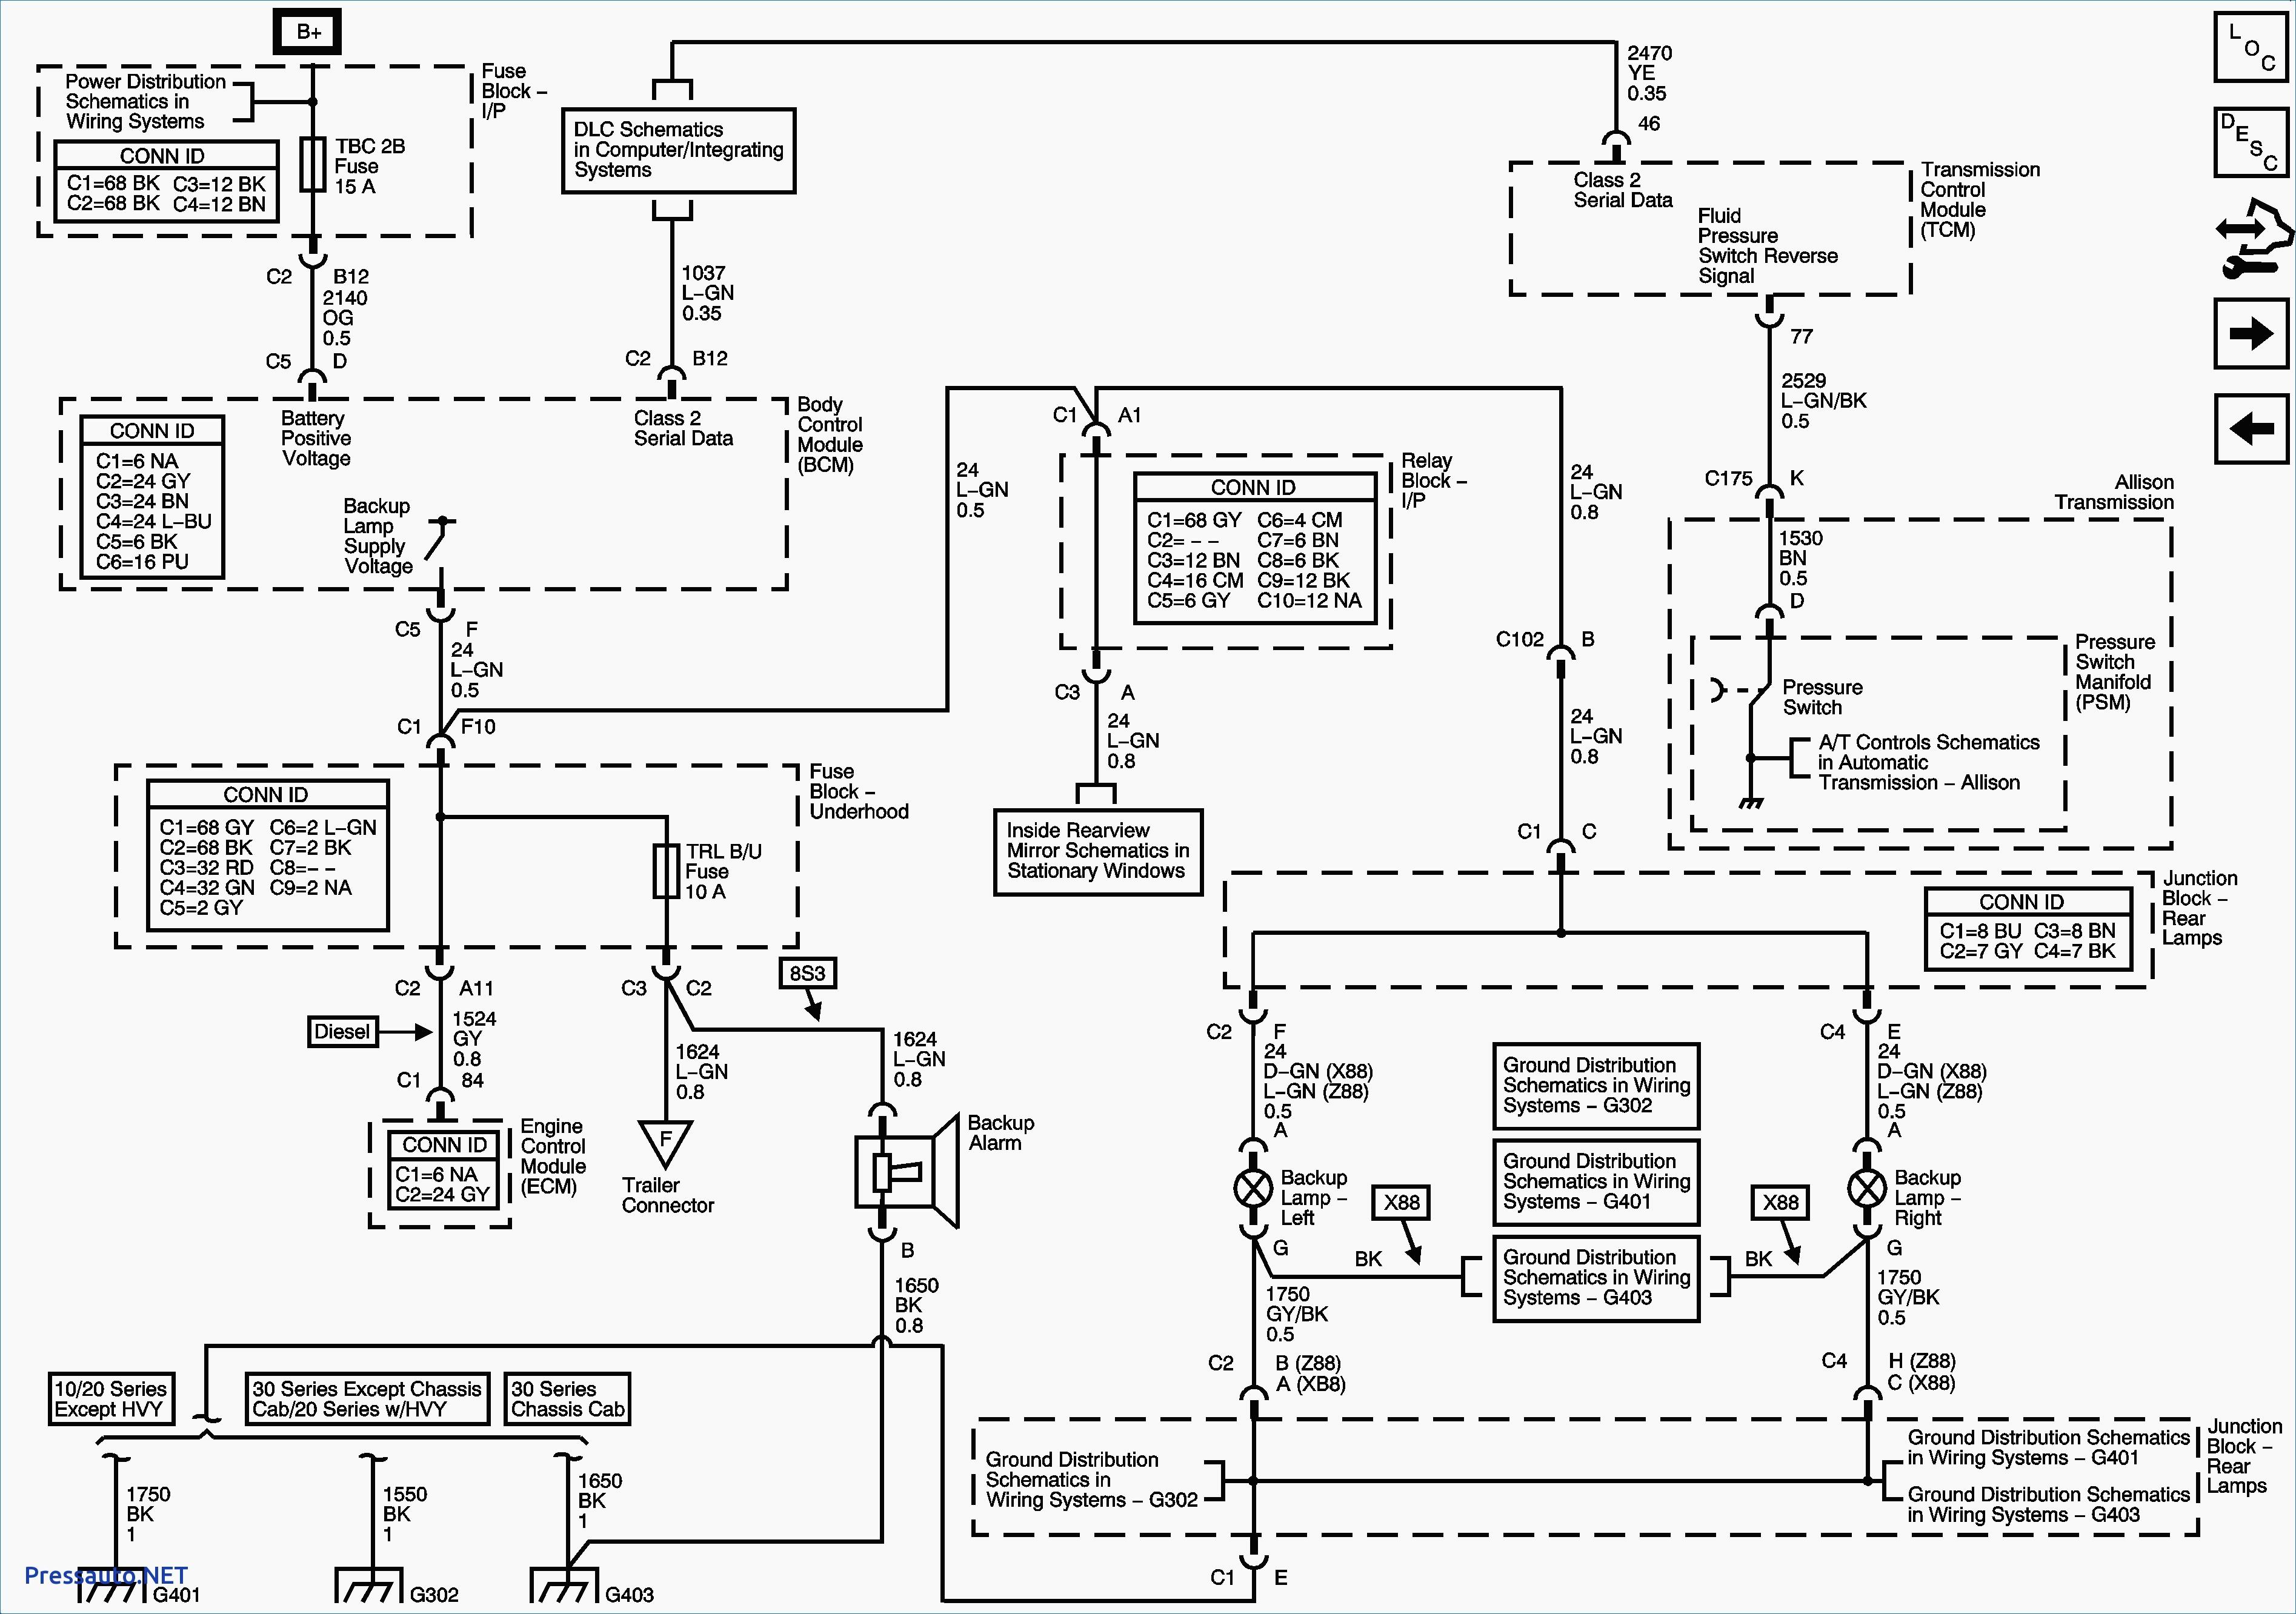 2002 Chevrolet Kodiak Wiring Diagram - Wiring Diagram Replace  theory-display - theory-display.miramontiseo.it | 2004 C4500 Wiring Diagrams |  | theory-display.miramontiseo.it